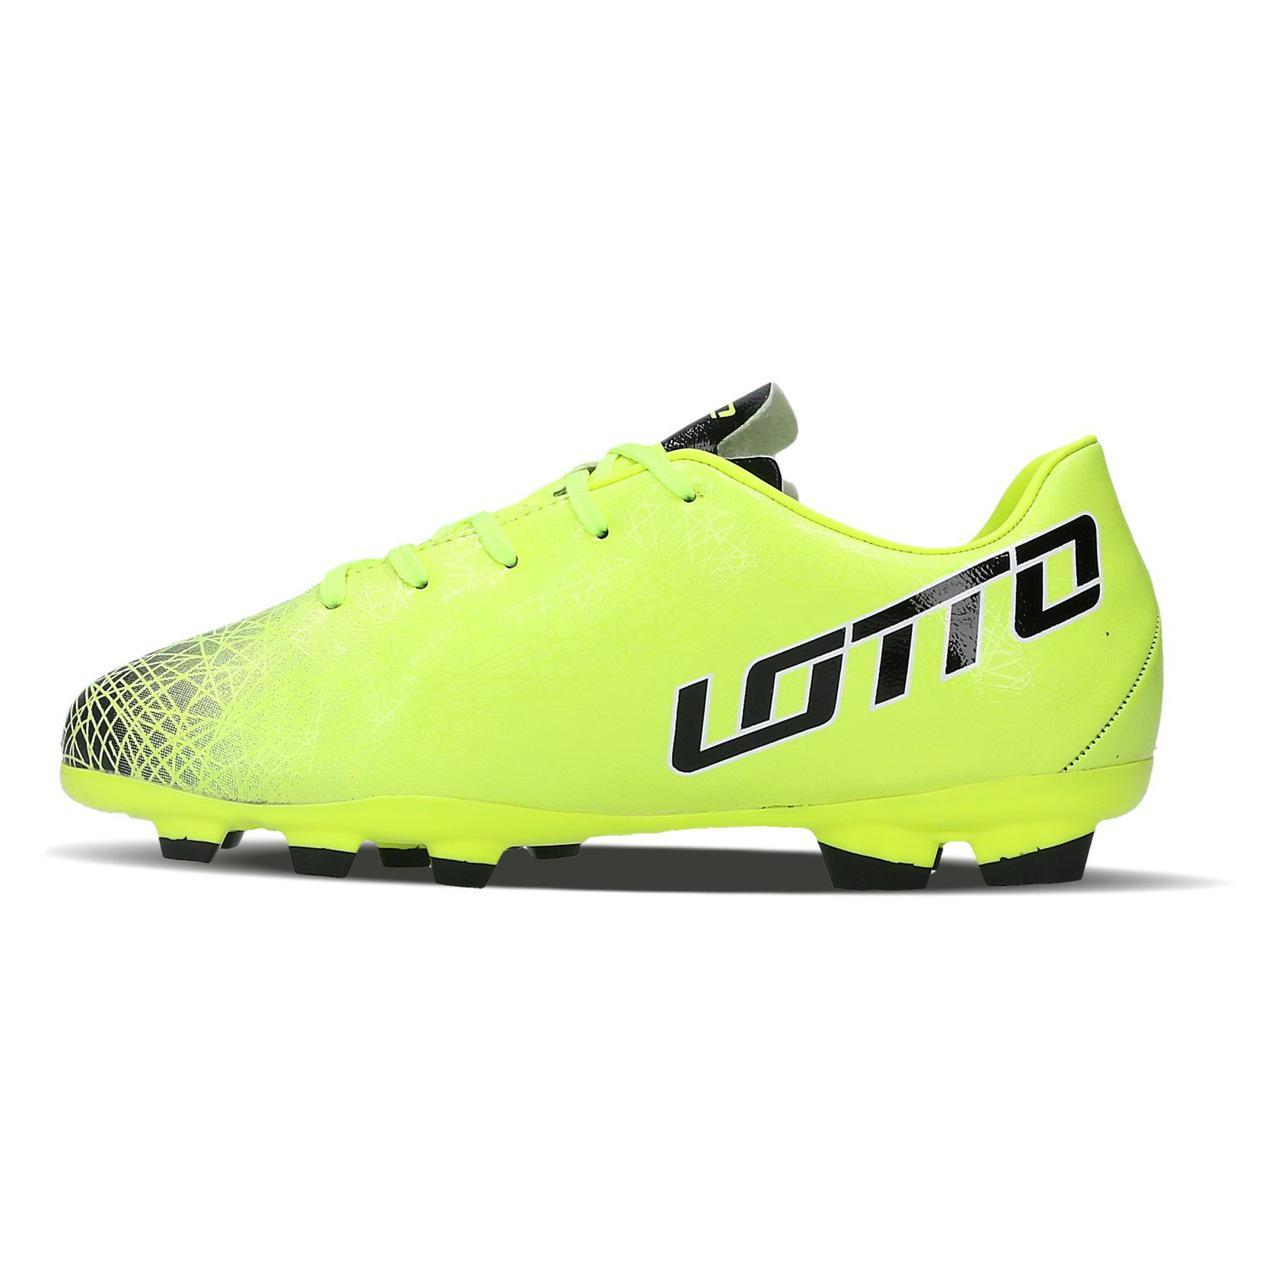 7e6df8d4 Бутсы Lotto LZG VII 700 FGT (FG-700), цена 1 250 грн./пара, купить в ...